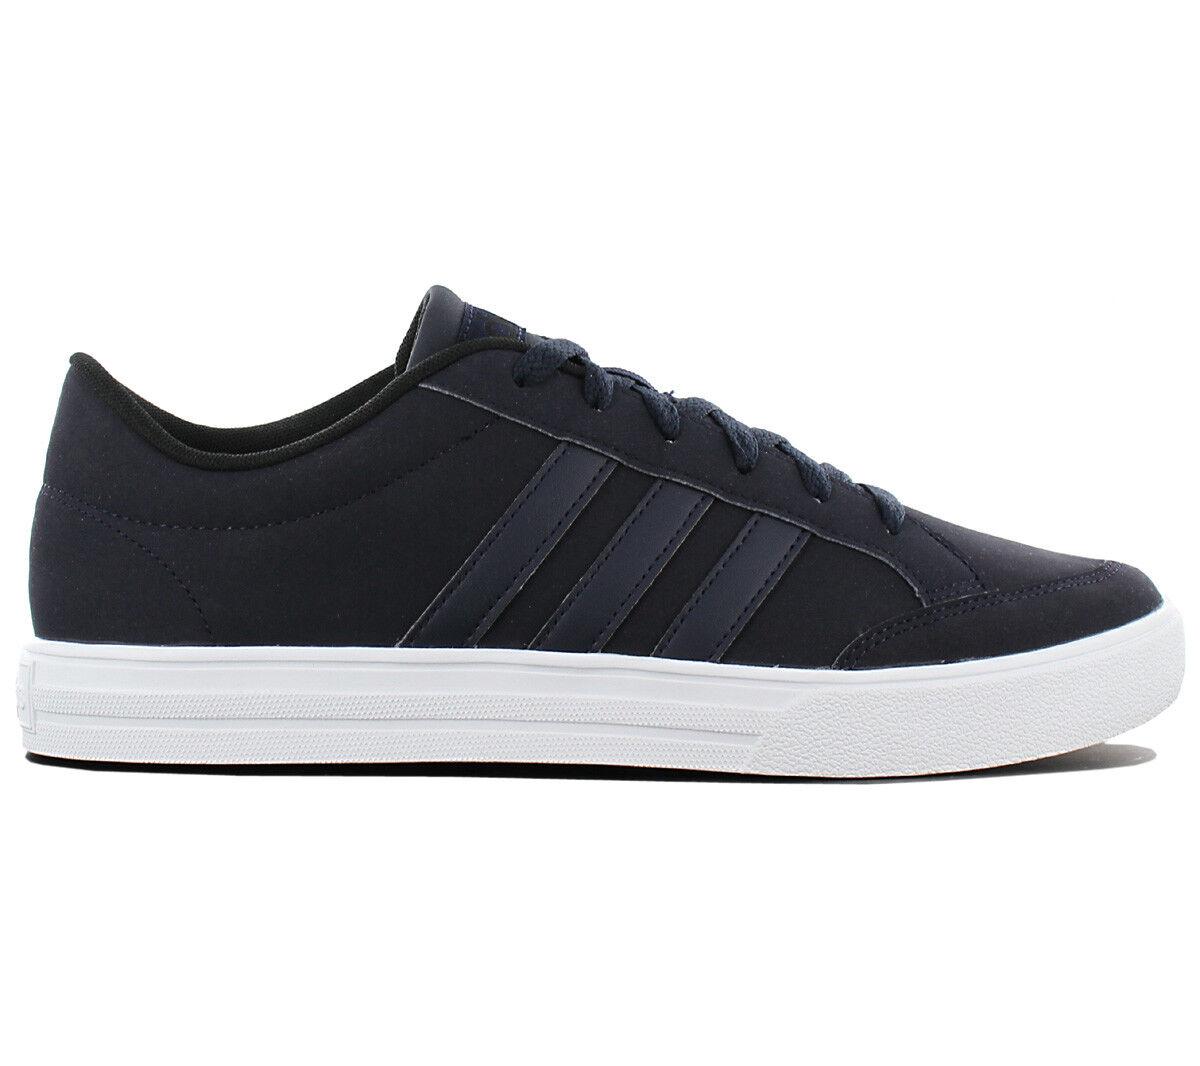 Adidas VS Set Low Herren Turnschuhe Schuhe Grau Grau Grau Turnschuhe B43891 Skaterschuhe NEU 86c2d6